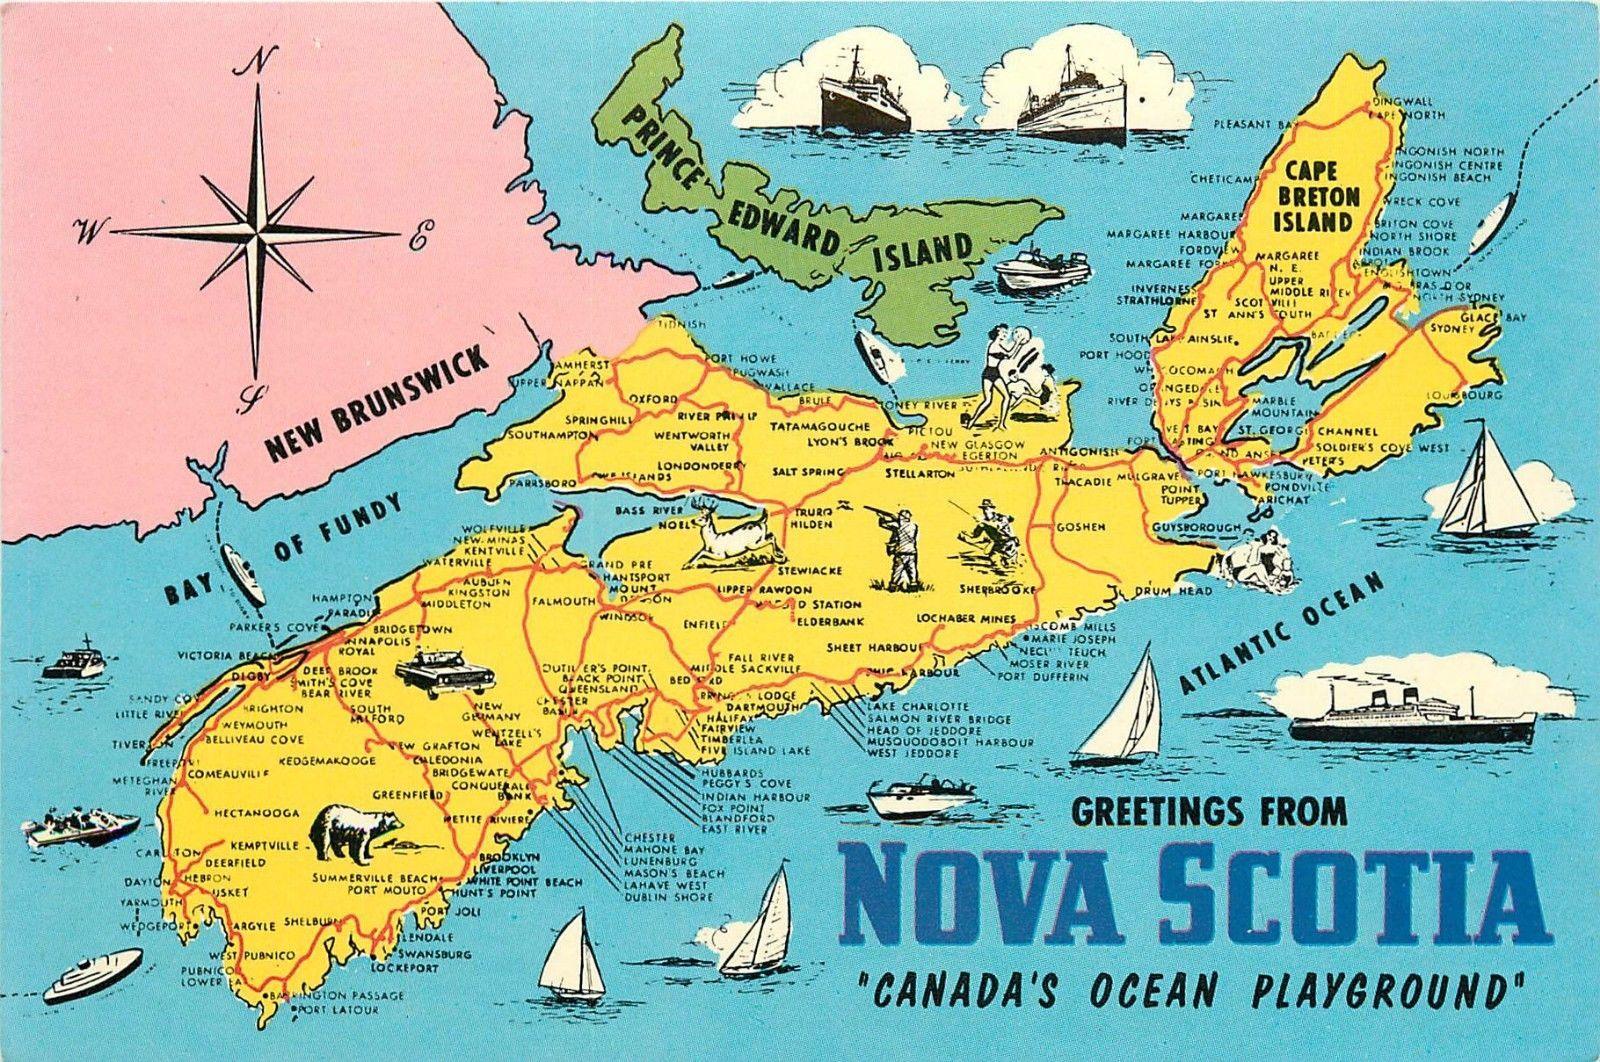 Nova Scotia Canada Map Greetings Pei New Brunswick Cape